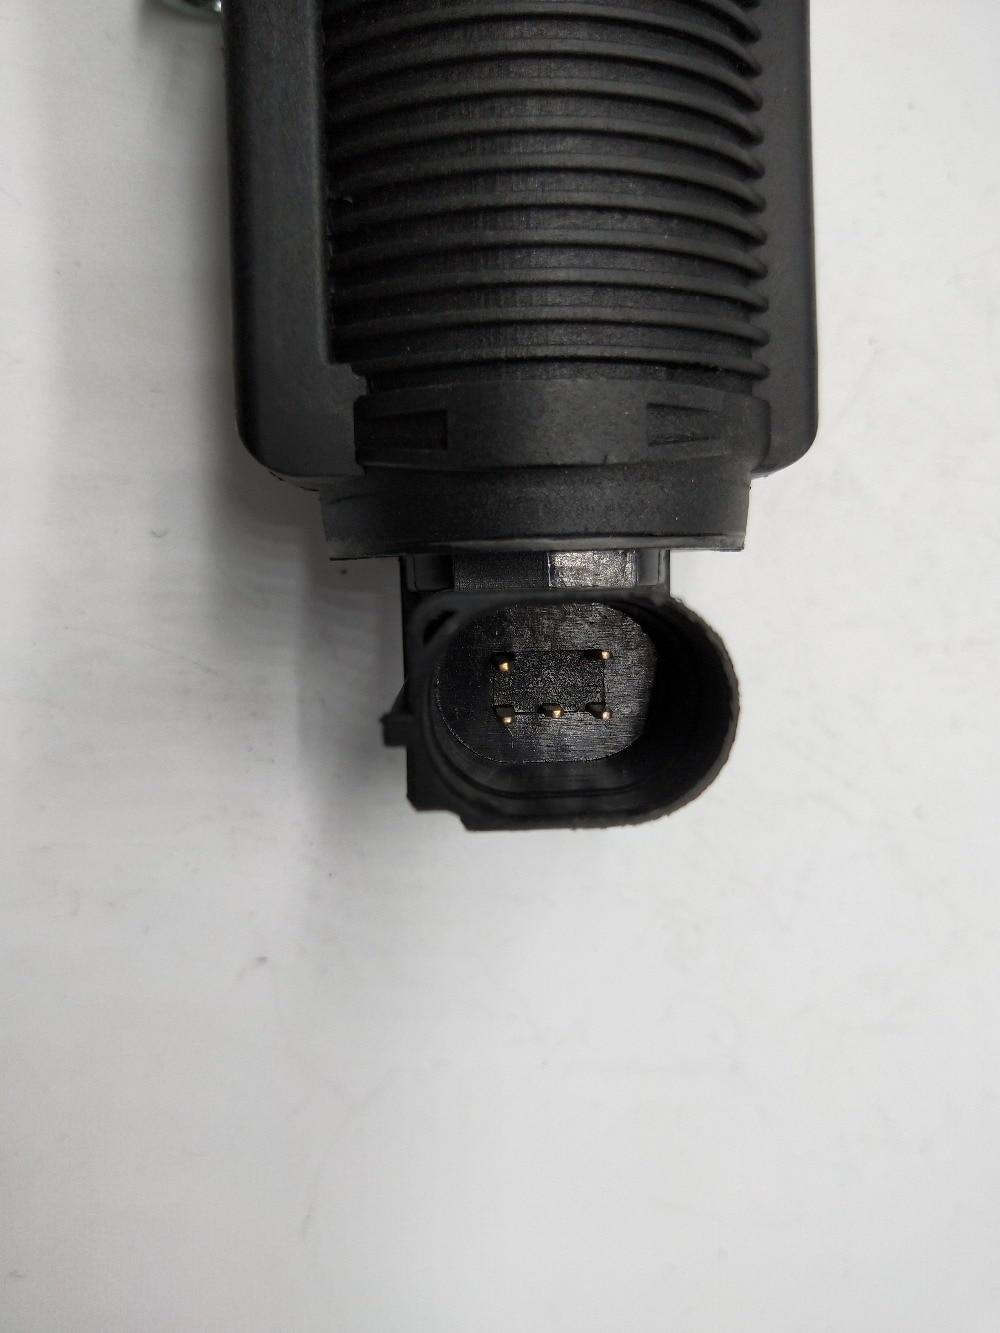 small resolution of aliexpress com buy egr valve for dacia logan sandero nissan kubistar micra suzuki jimny renault clio grand scenic kangoo megane modus thalia 1 5 from